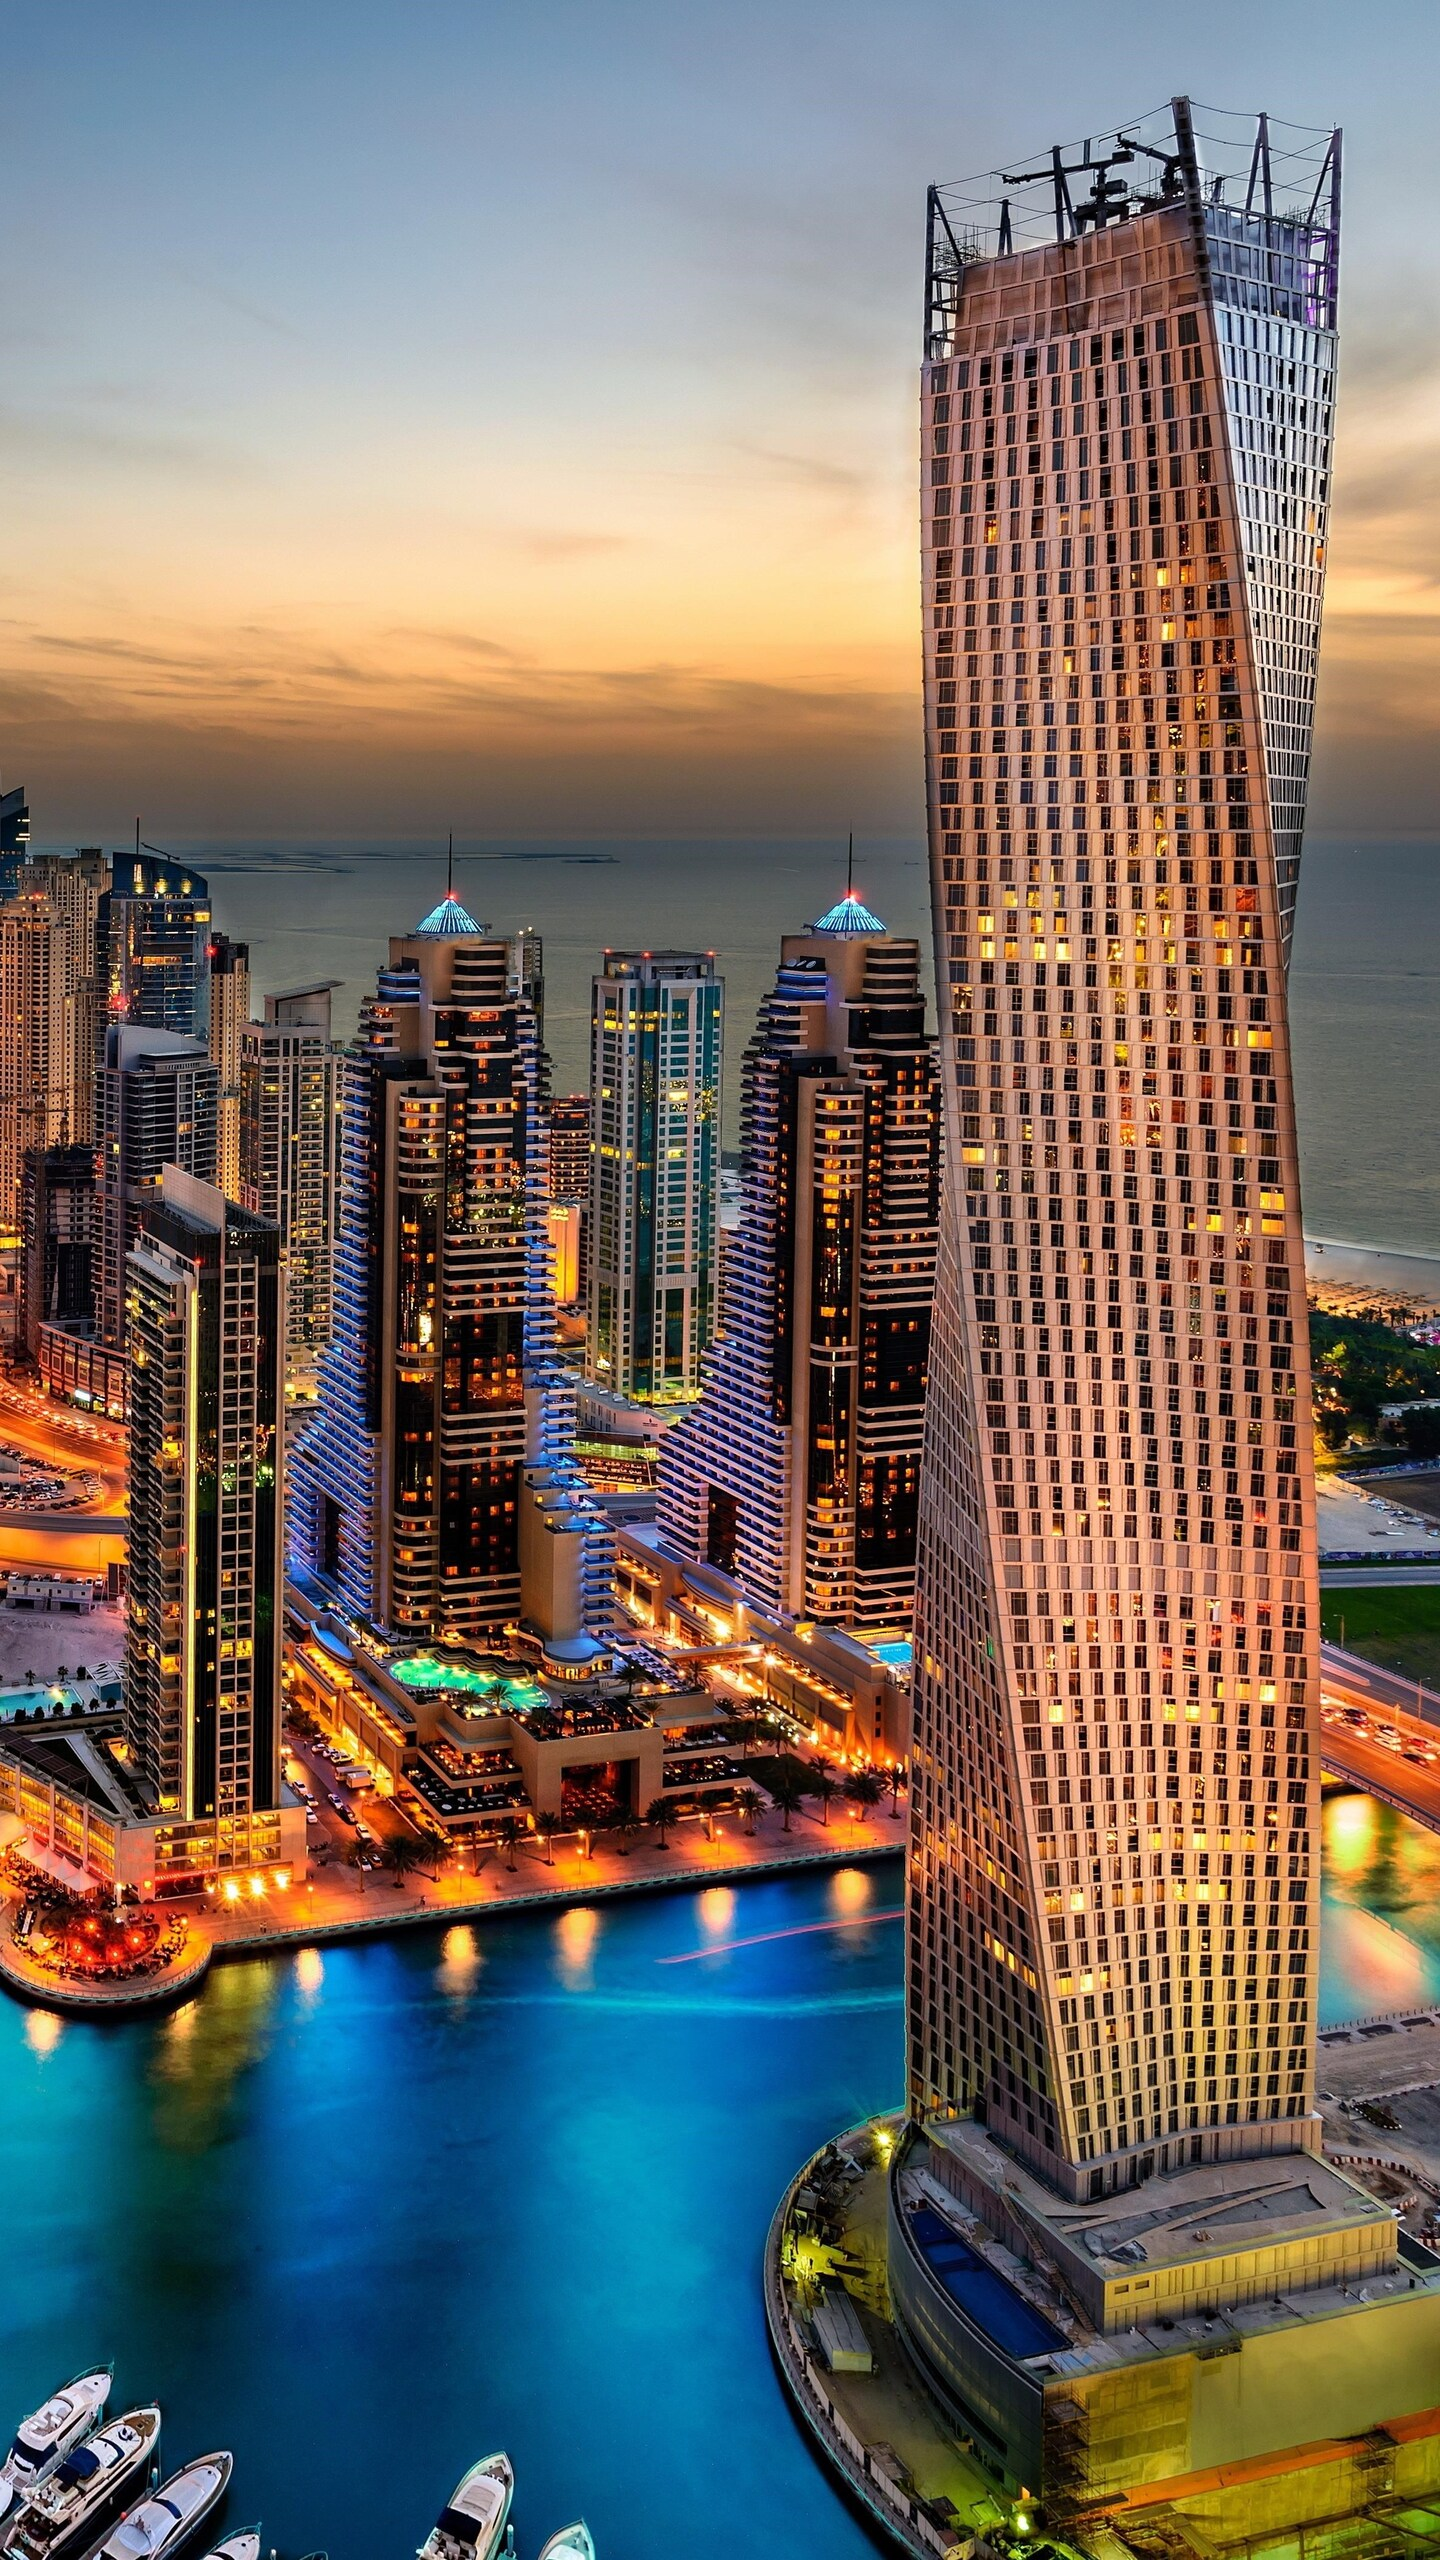 1440x2560 dubai uae building skyscrappers night samsung - Wallpaper hd 4k ...